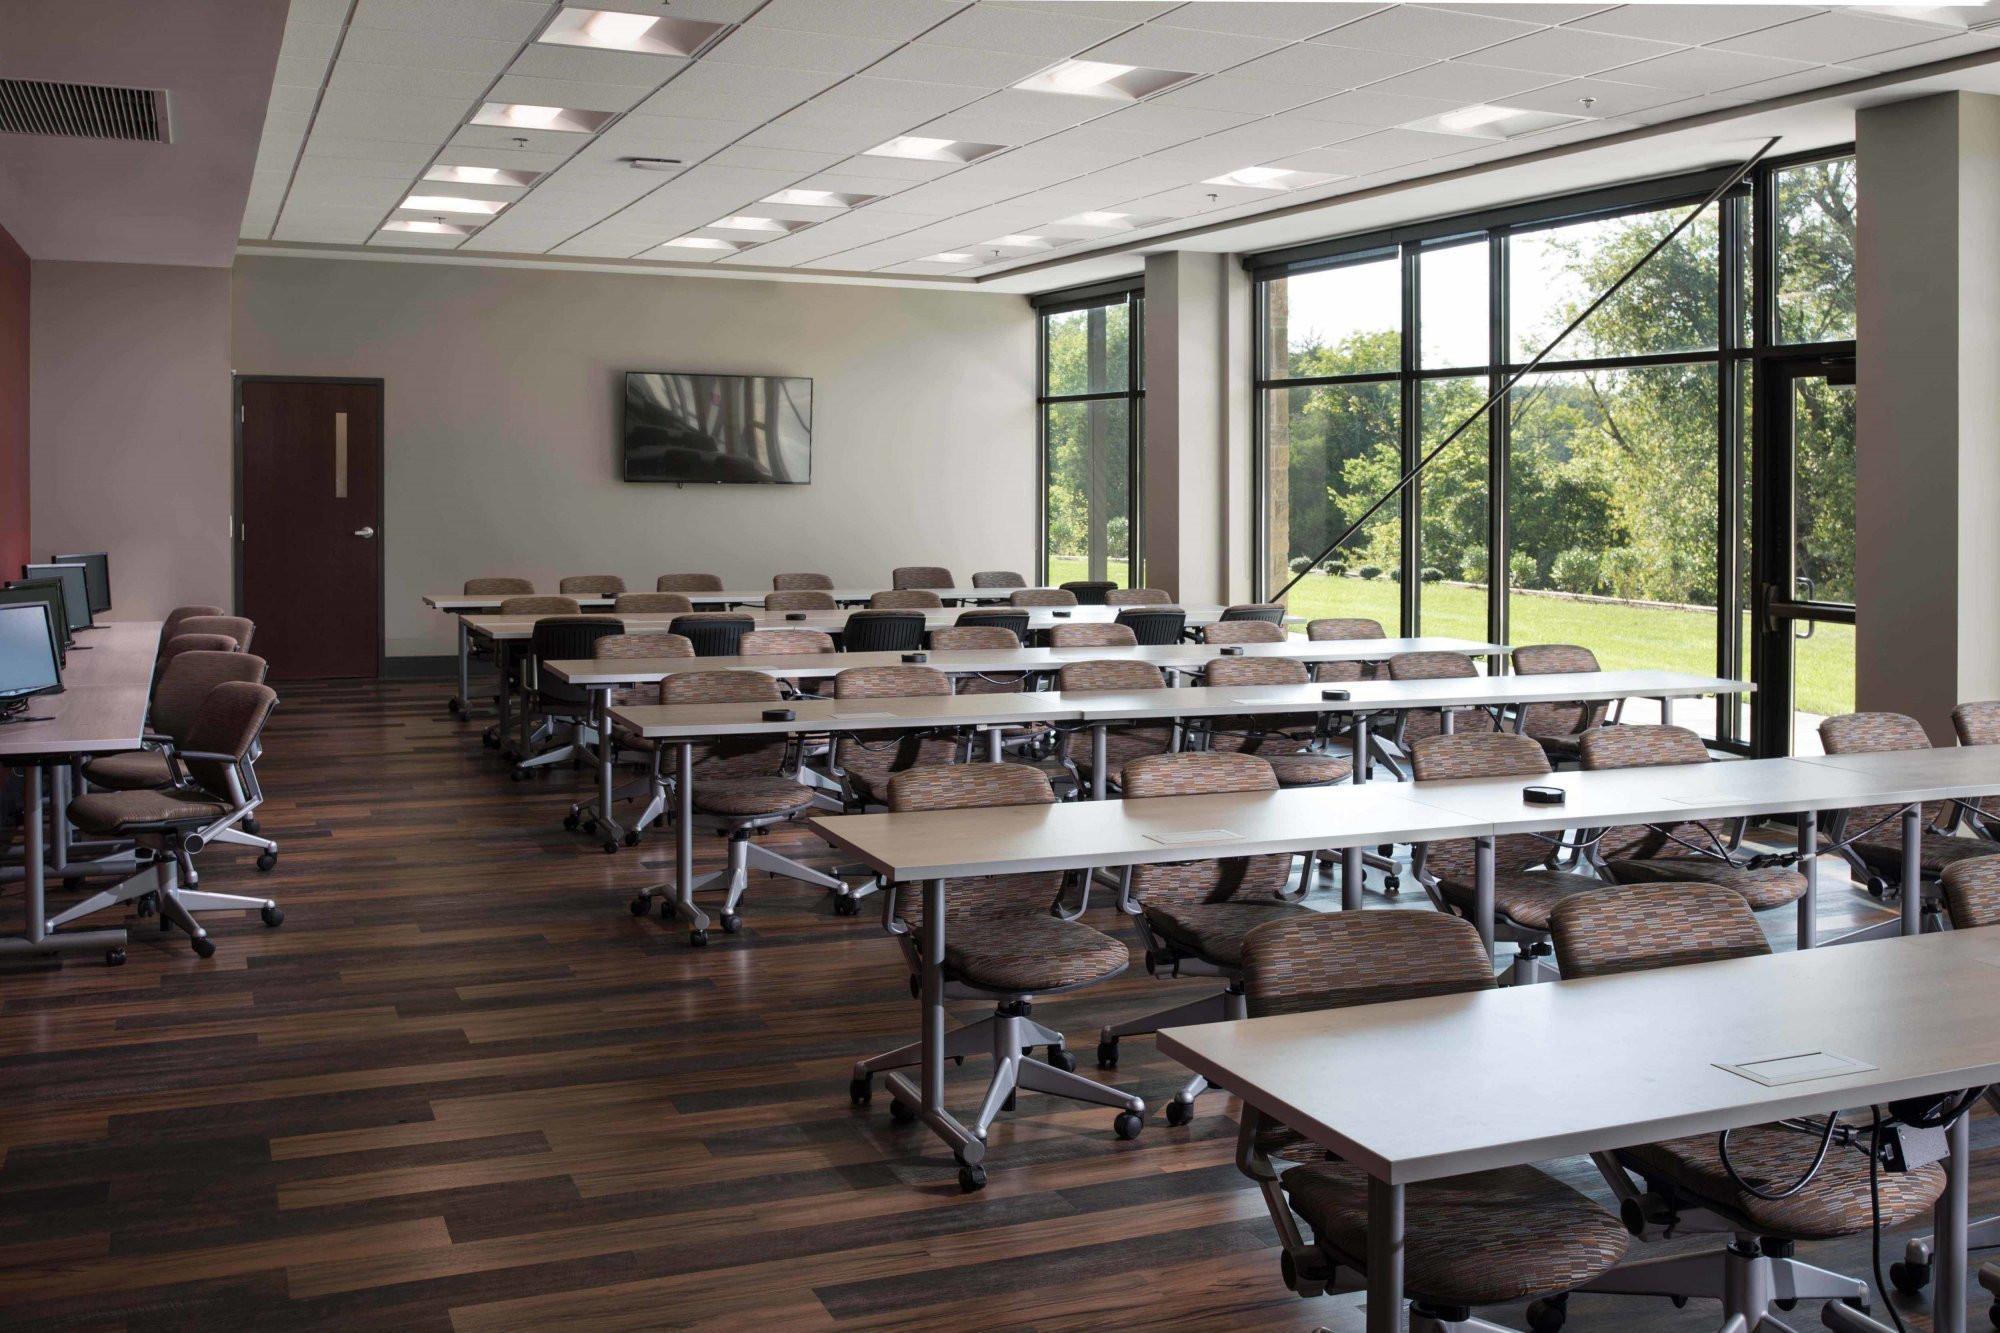 donan-engineering-new-headquarters-office-building-interior-workspace